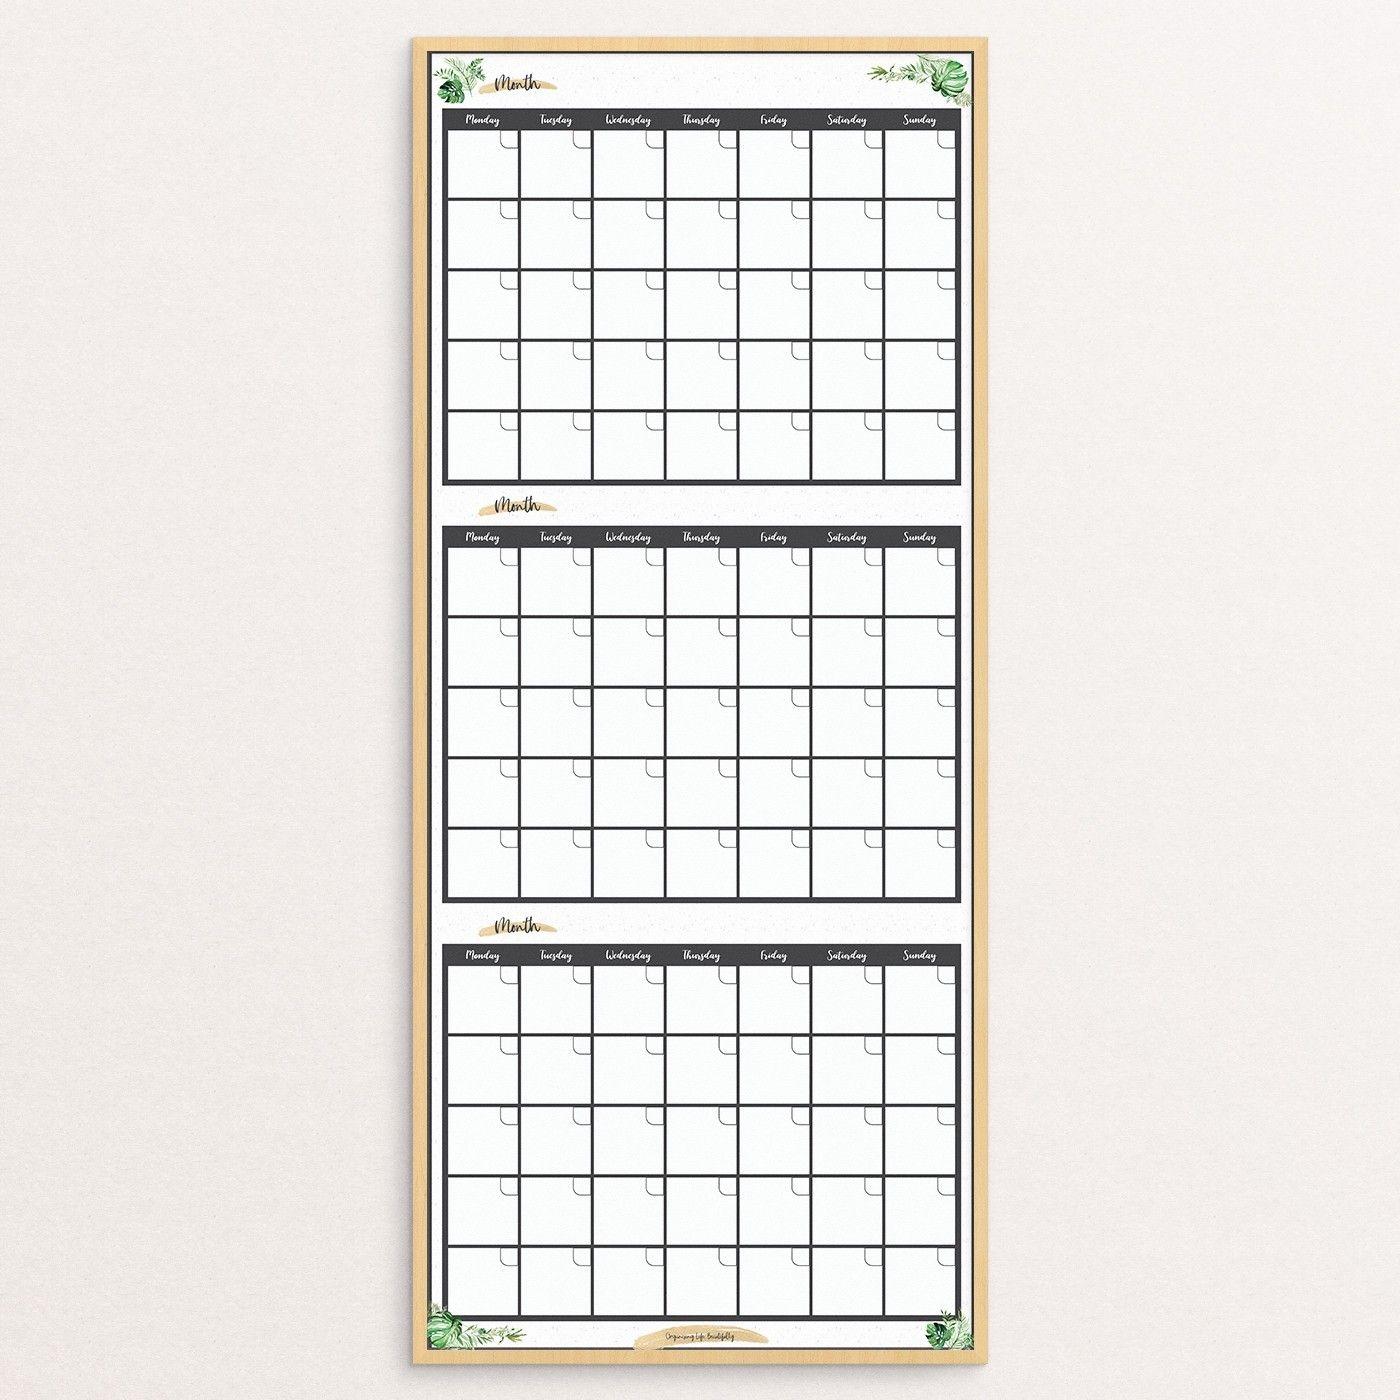 Greenery_Wood Frame_3Mth Planner | Atp Creative Design